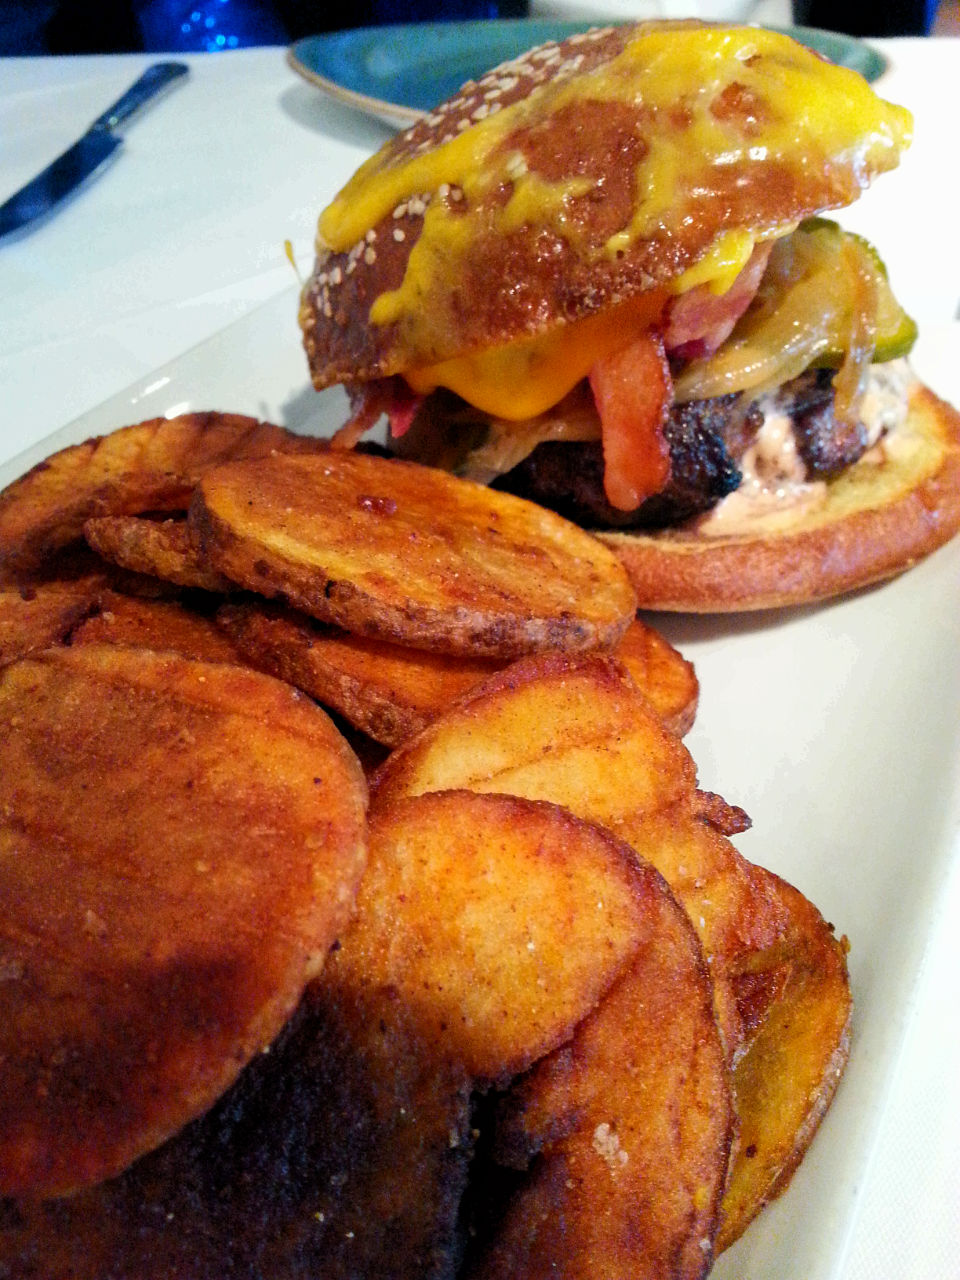 The glorious, decadent 50/50 Burger / photo credit: Michael Mackie